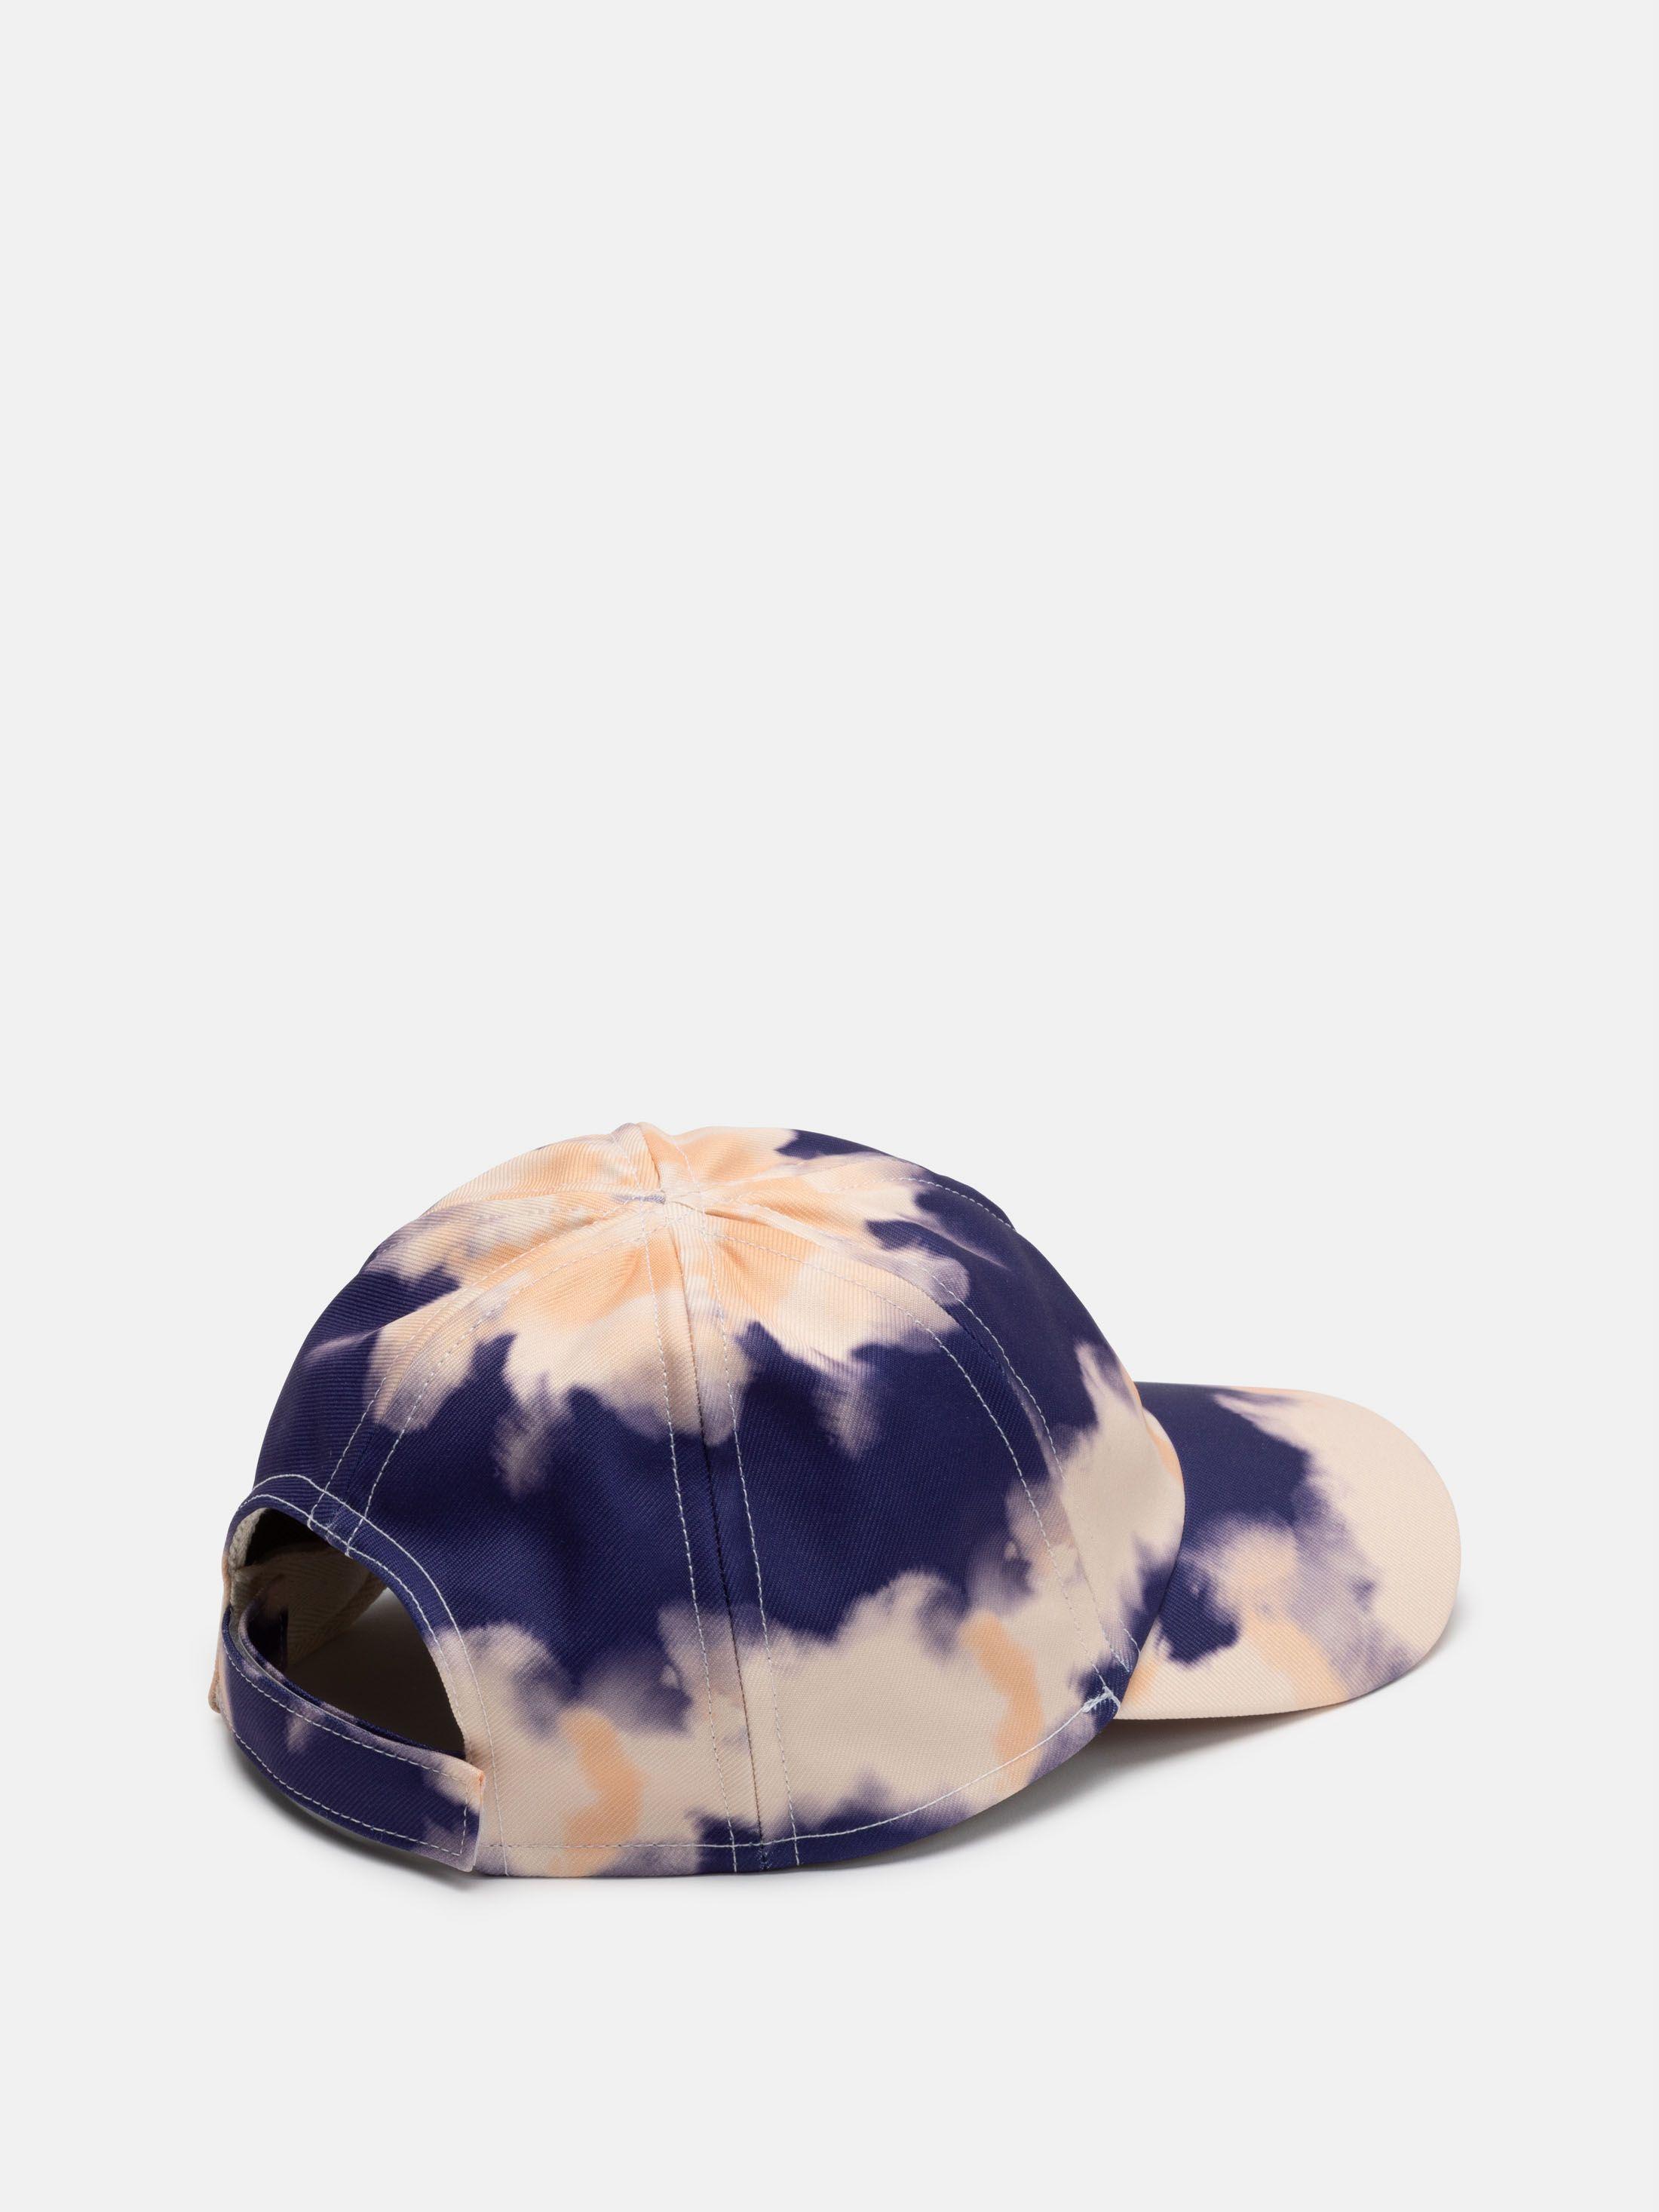 overview detail of customisable baseball cap